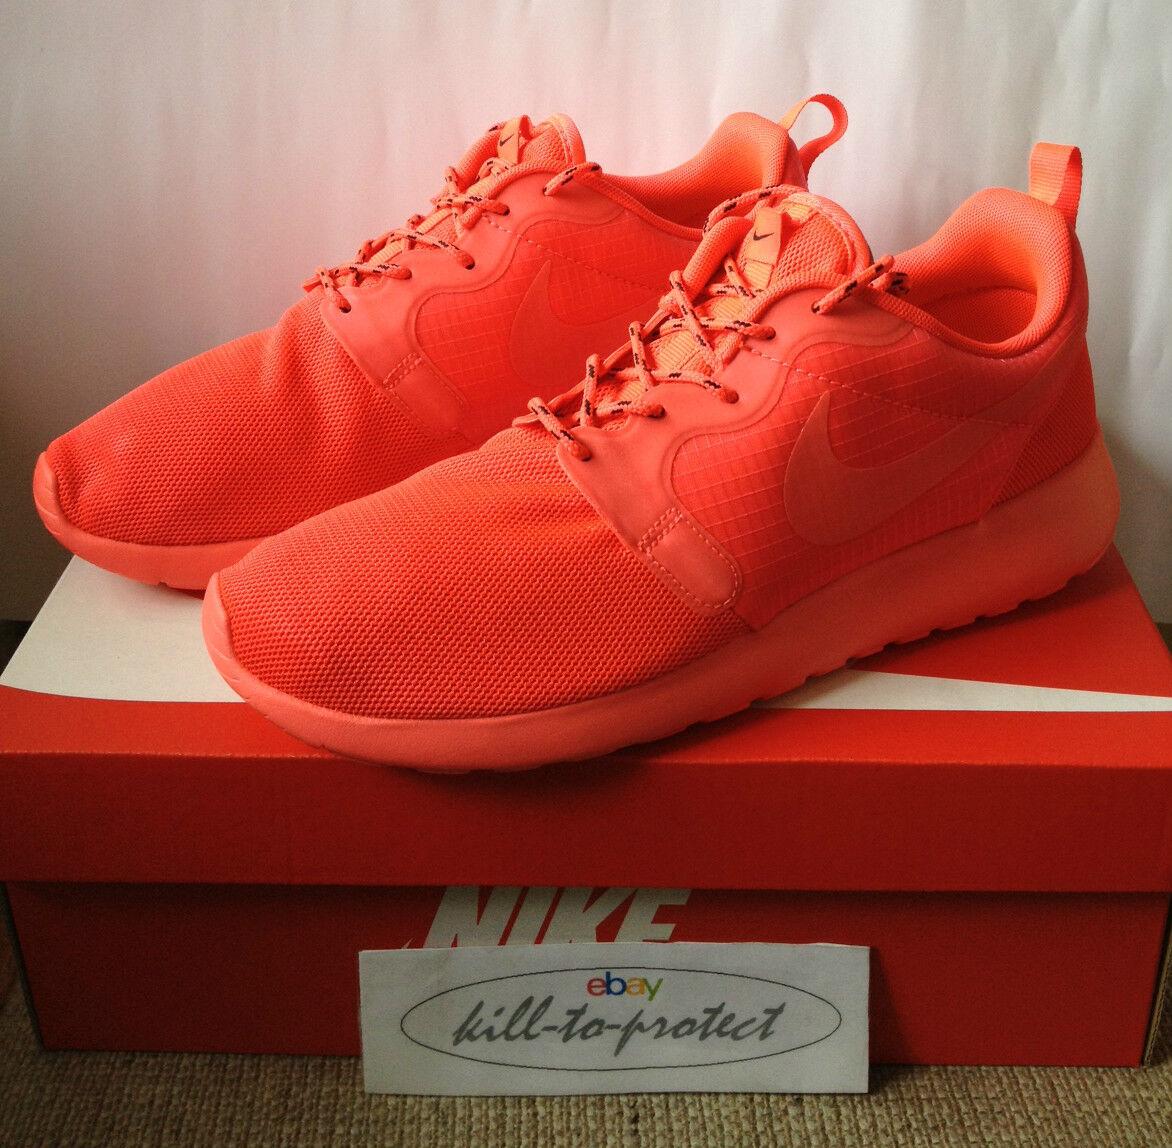 Nike WMNS Roshe Run crimson nous UK5 6 7 8 9 10 liberty Palm 642233-600 Rouge 2014